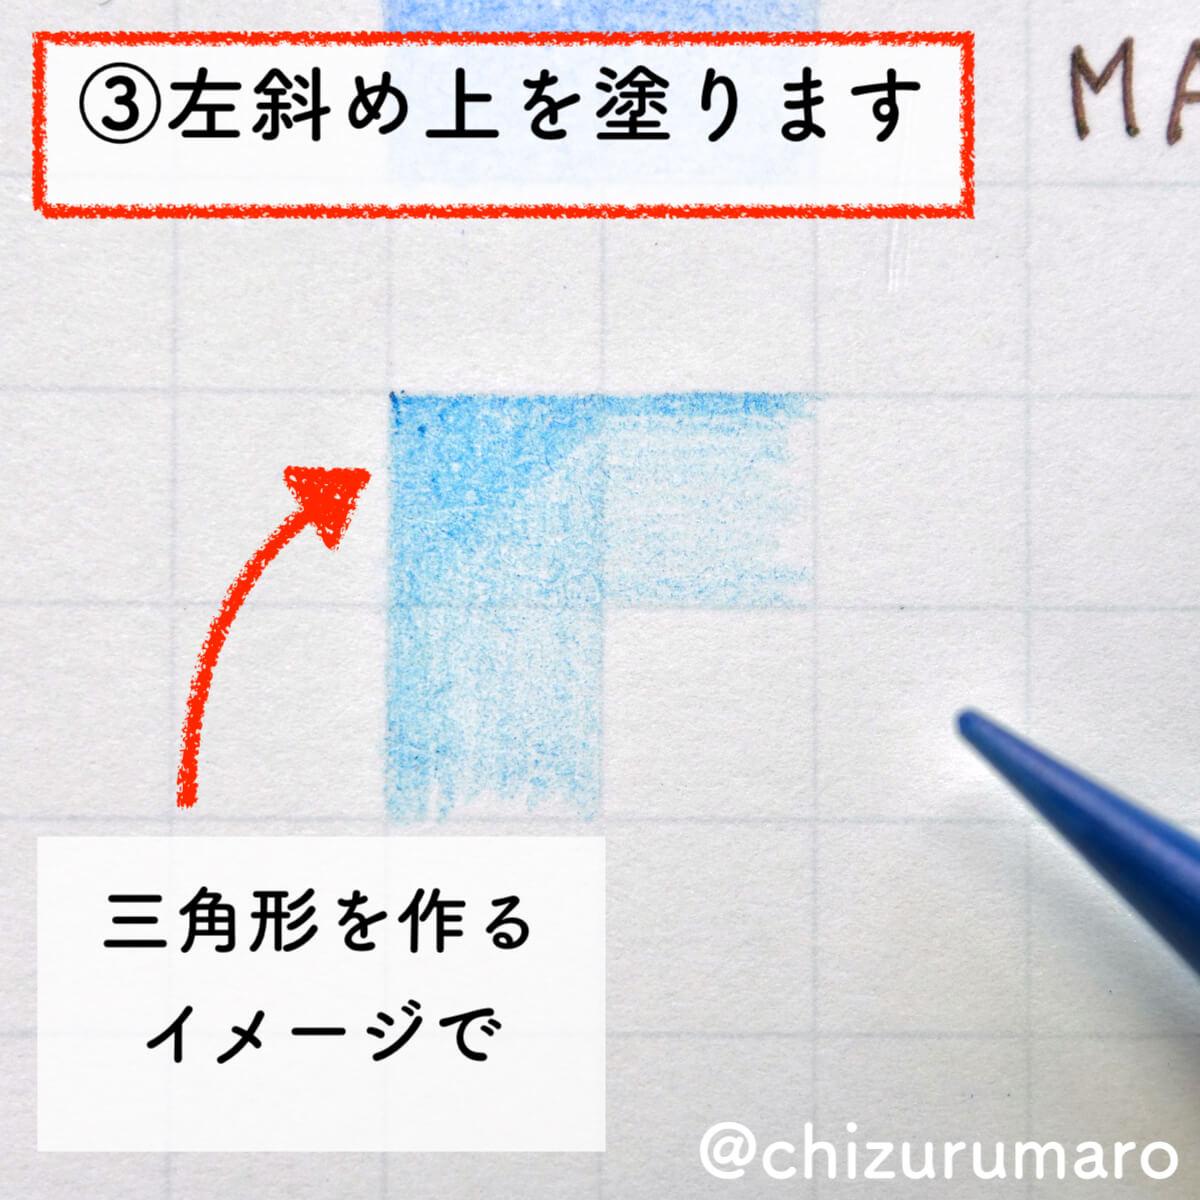 f:id:chizurumaro:20200921221032j:plain